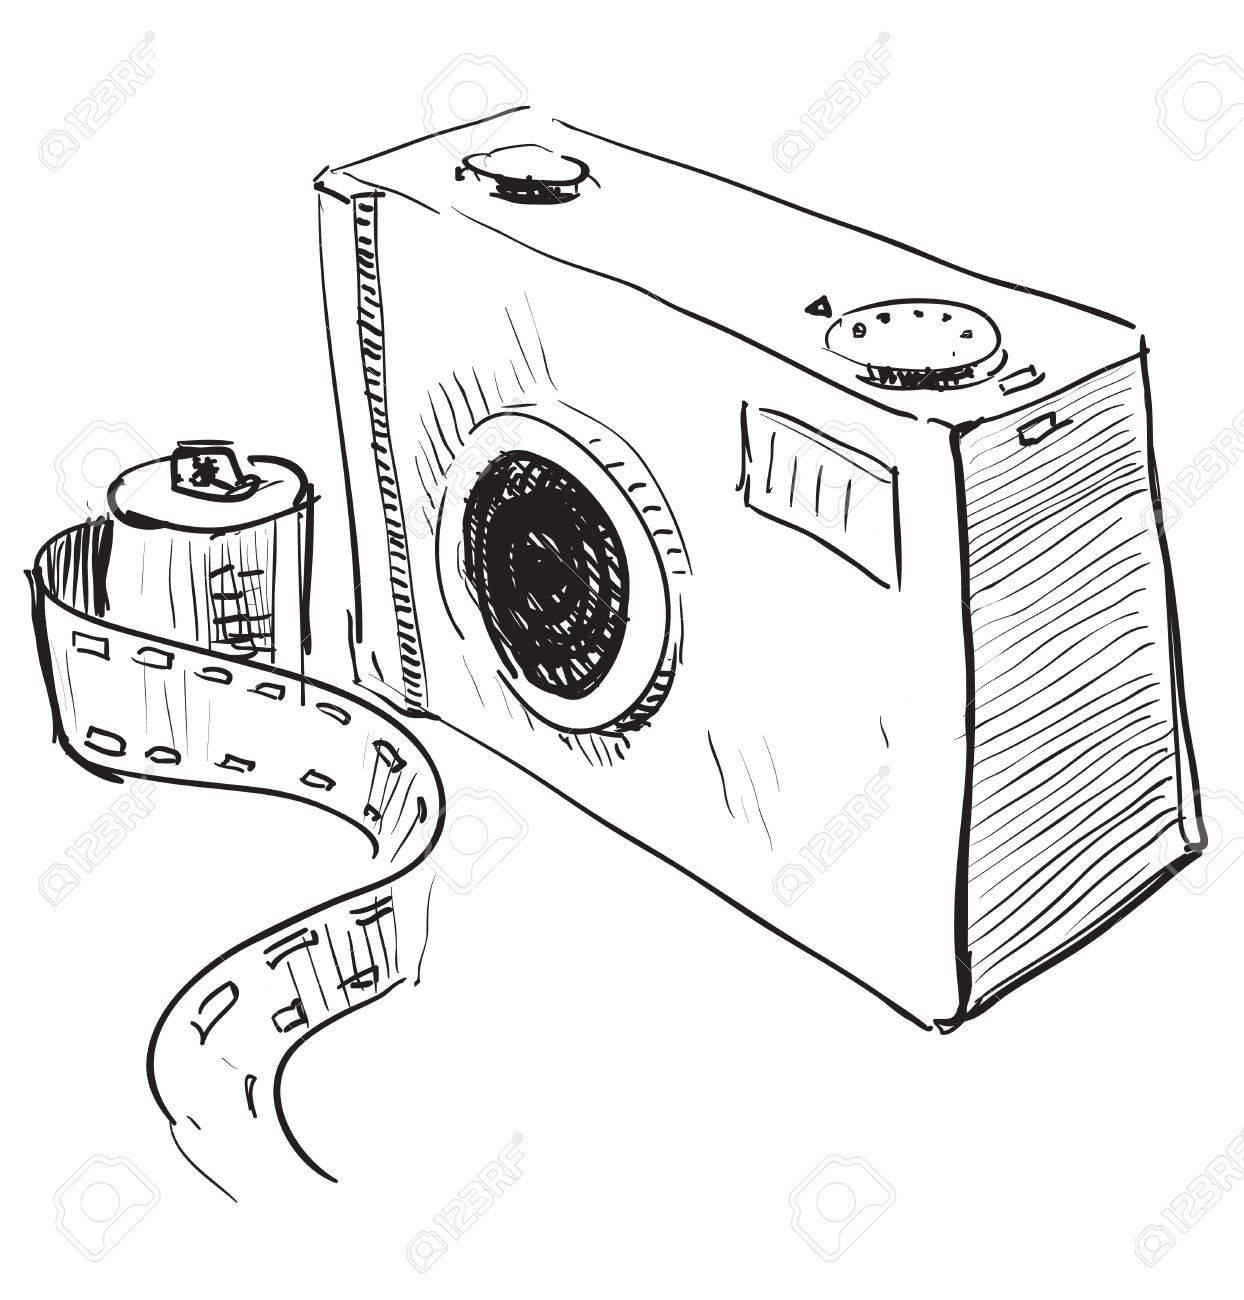 Analogue photo camera icon Stock Vector - 18269497